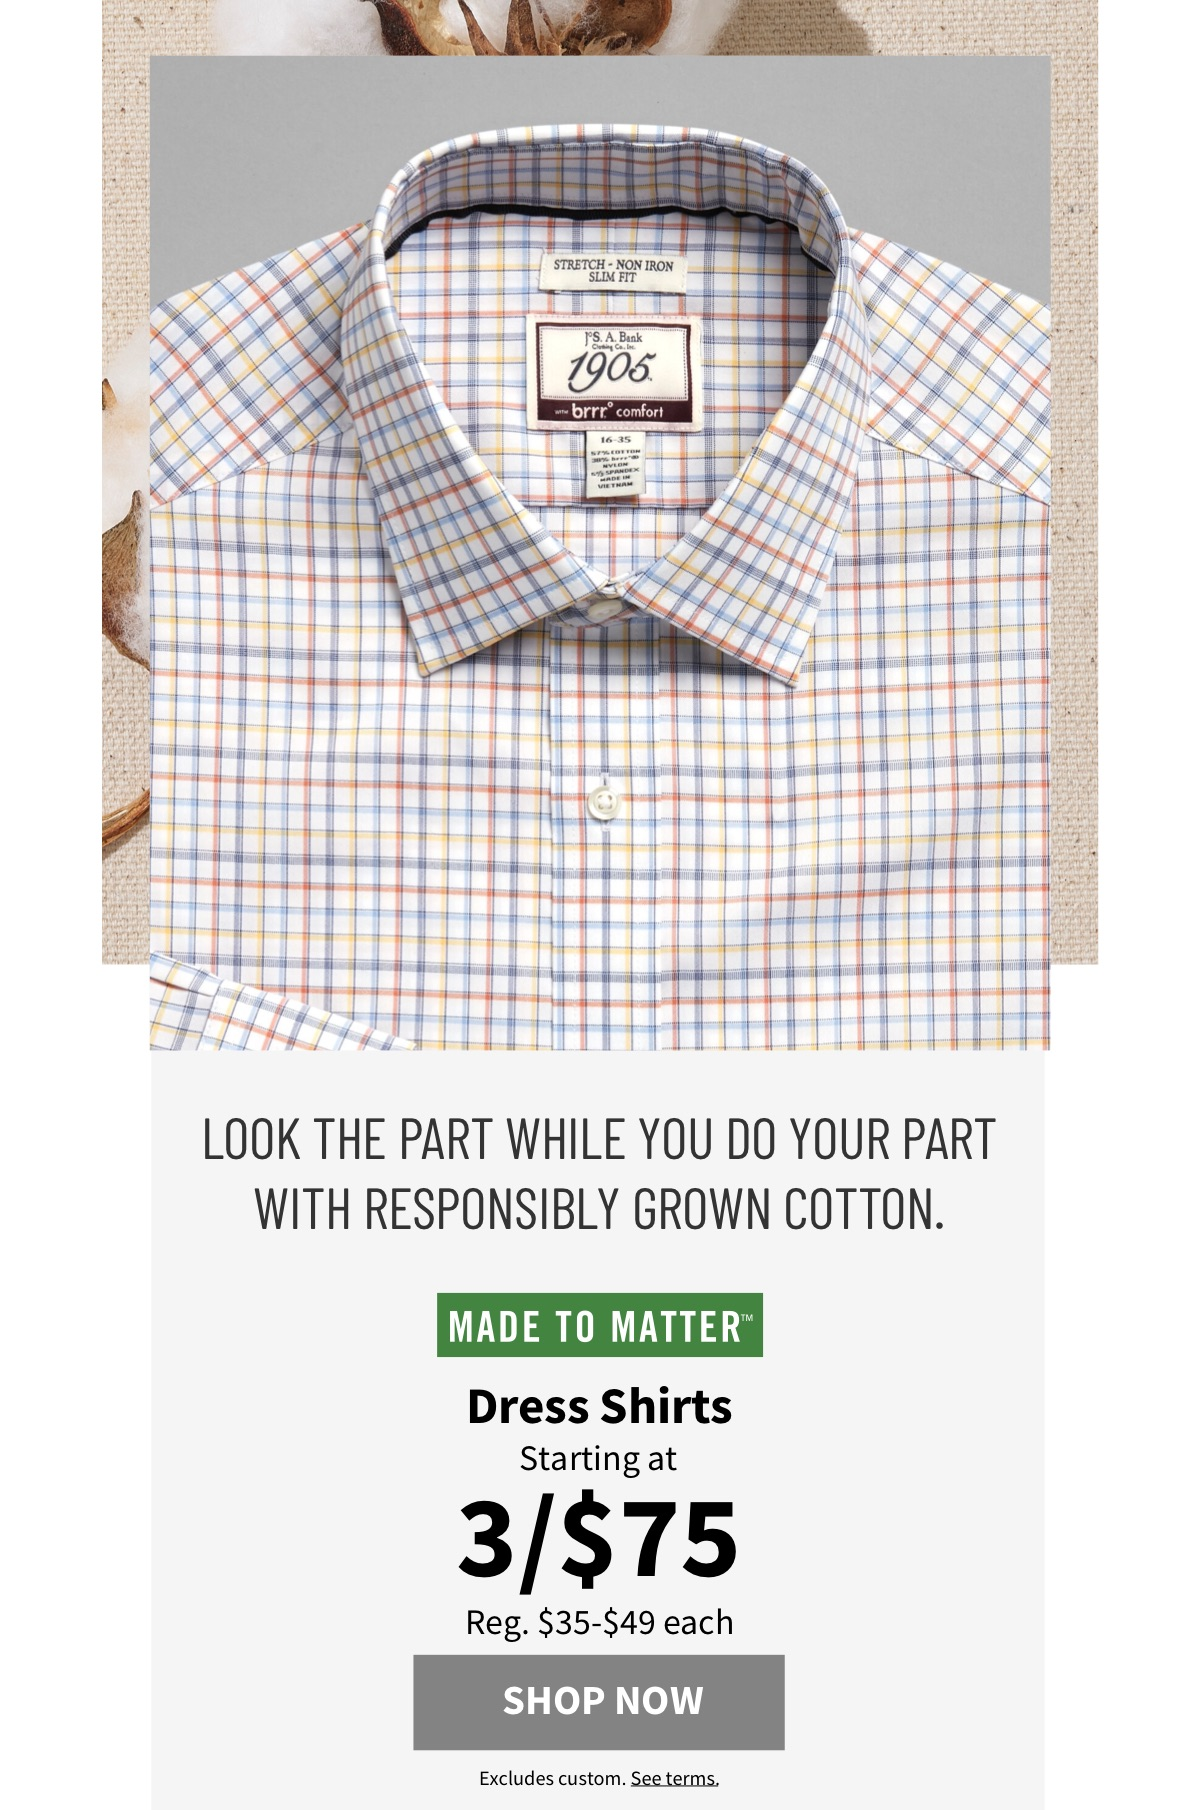 Made to Matter Dress Shirts Starting at 3/$75 - Shop Now